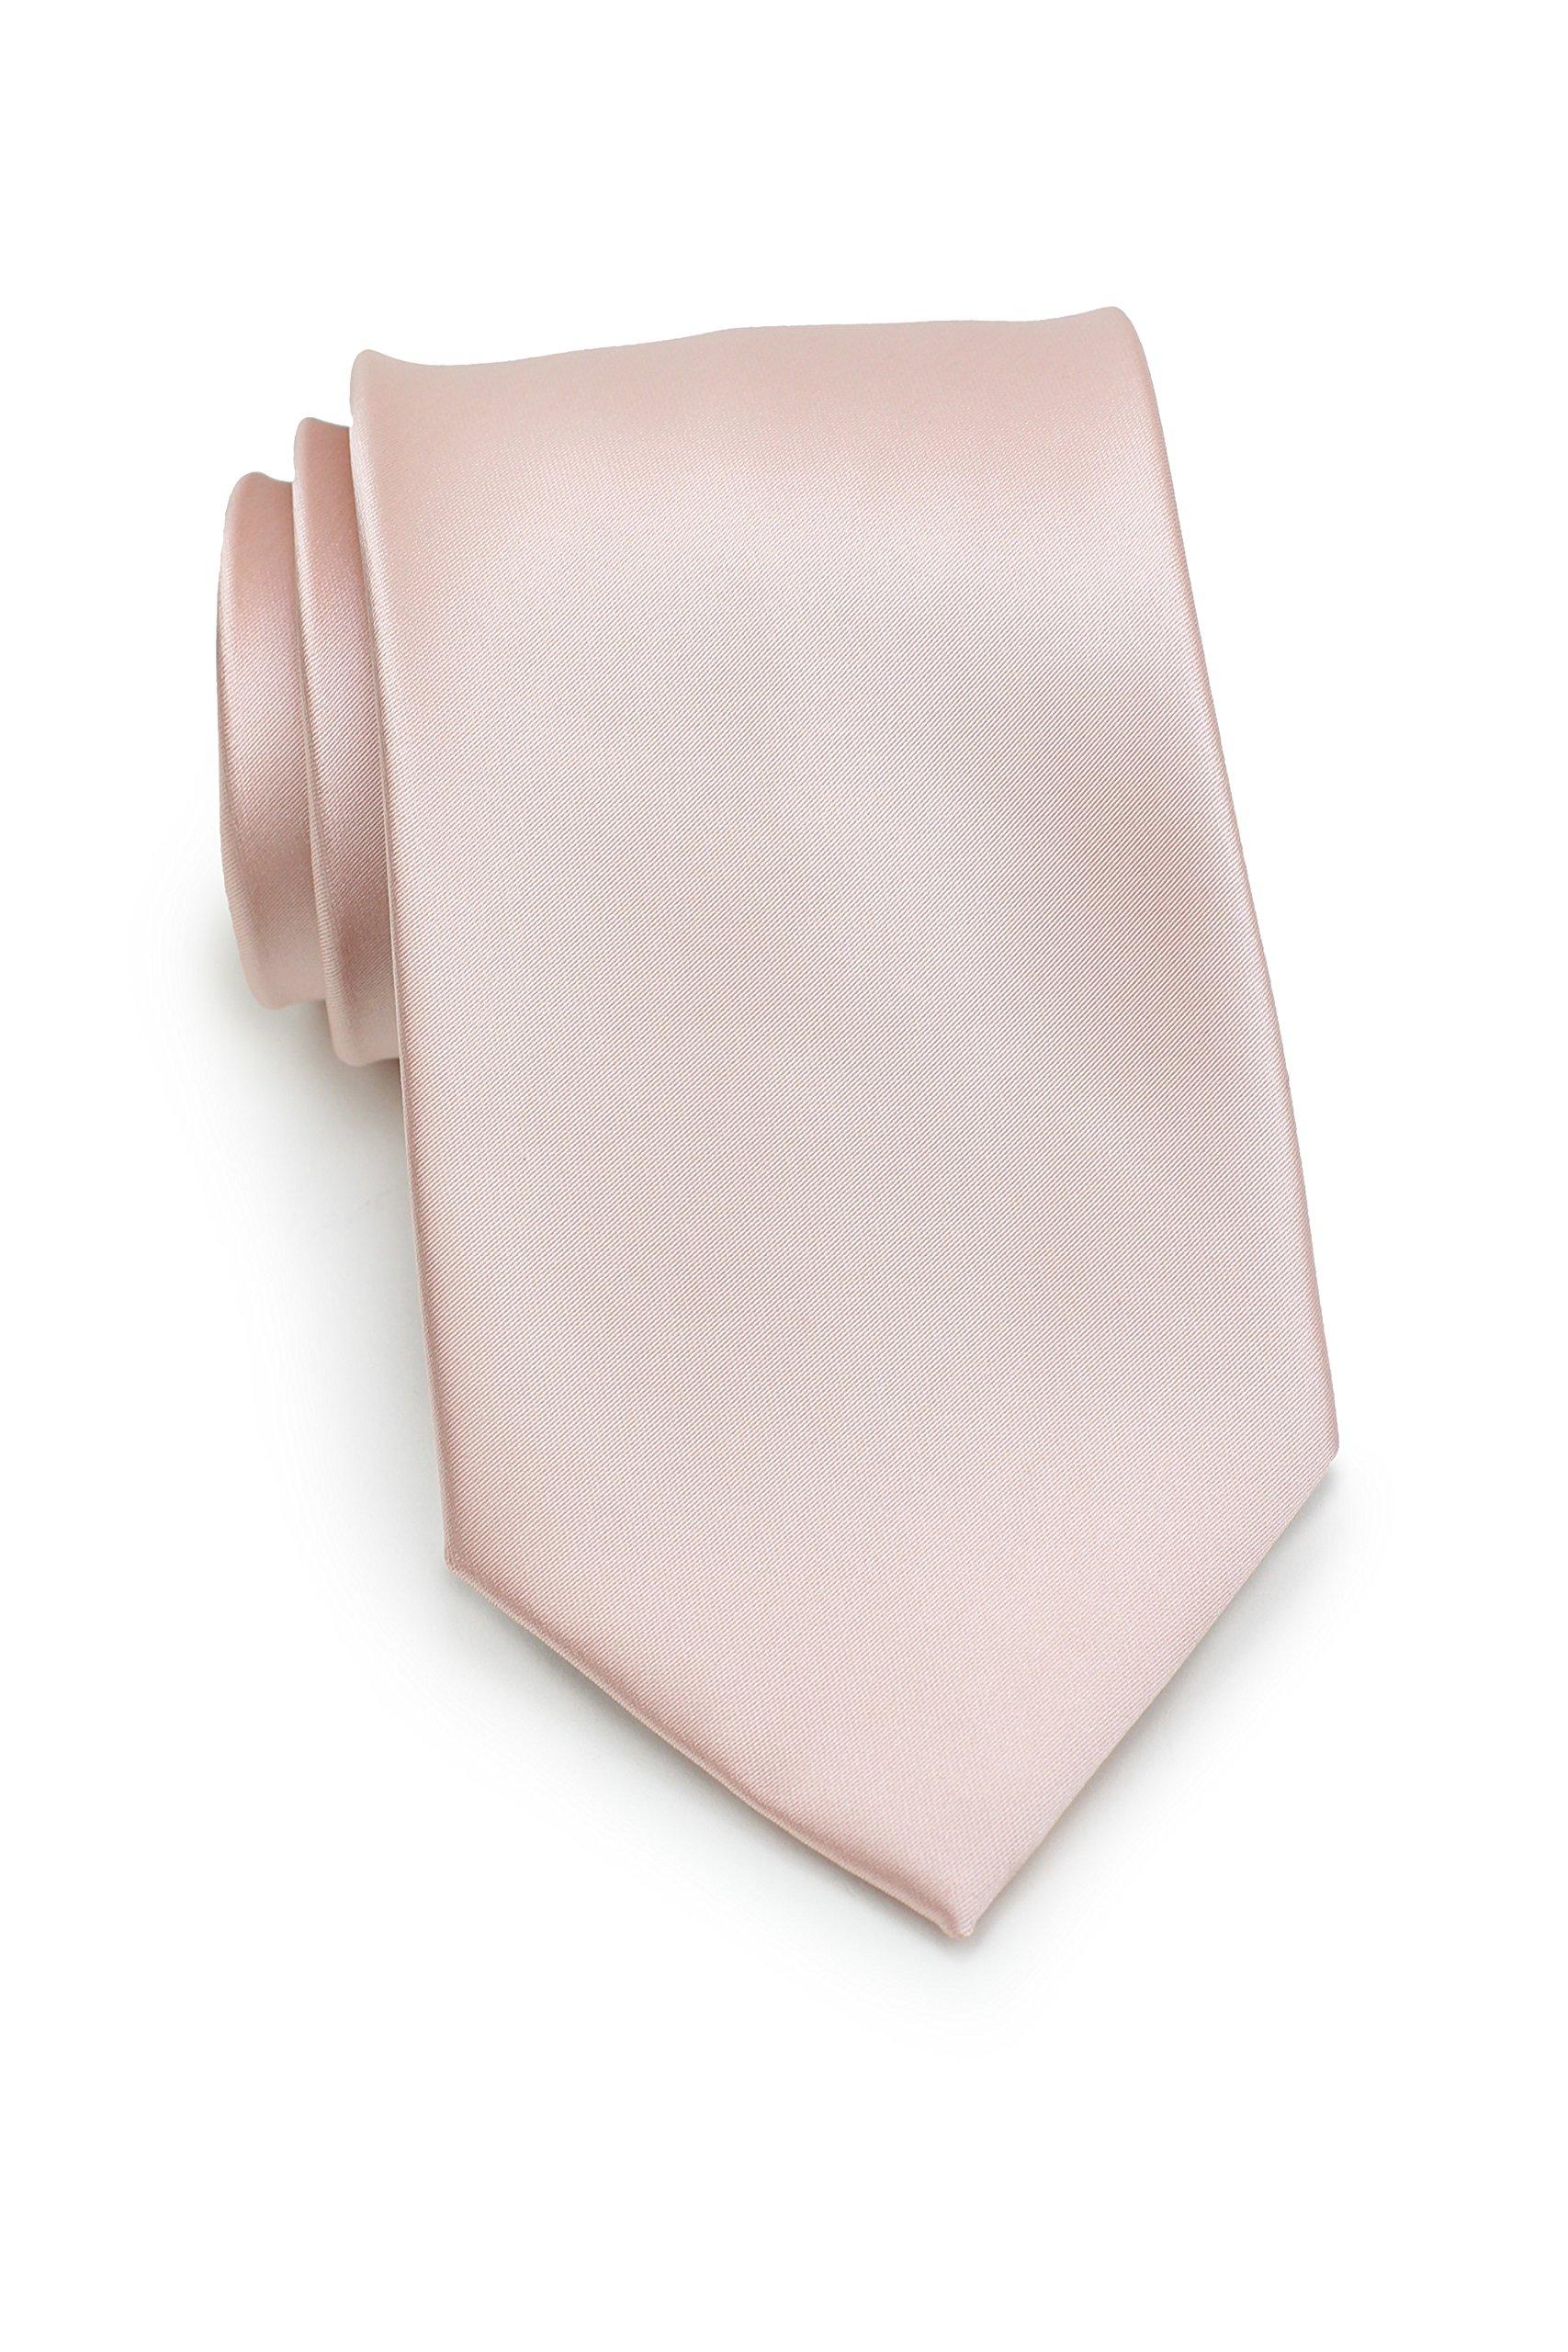 Bows-N-Ties Men's Necktie Solid Color Microfiber Satin Tie 3.25 Inches (Blush Pink)